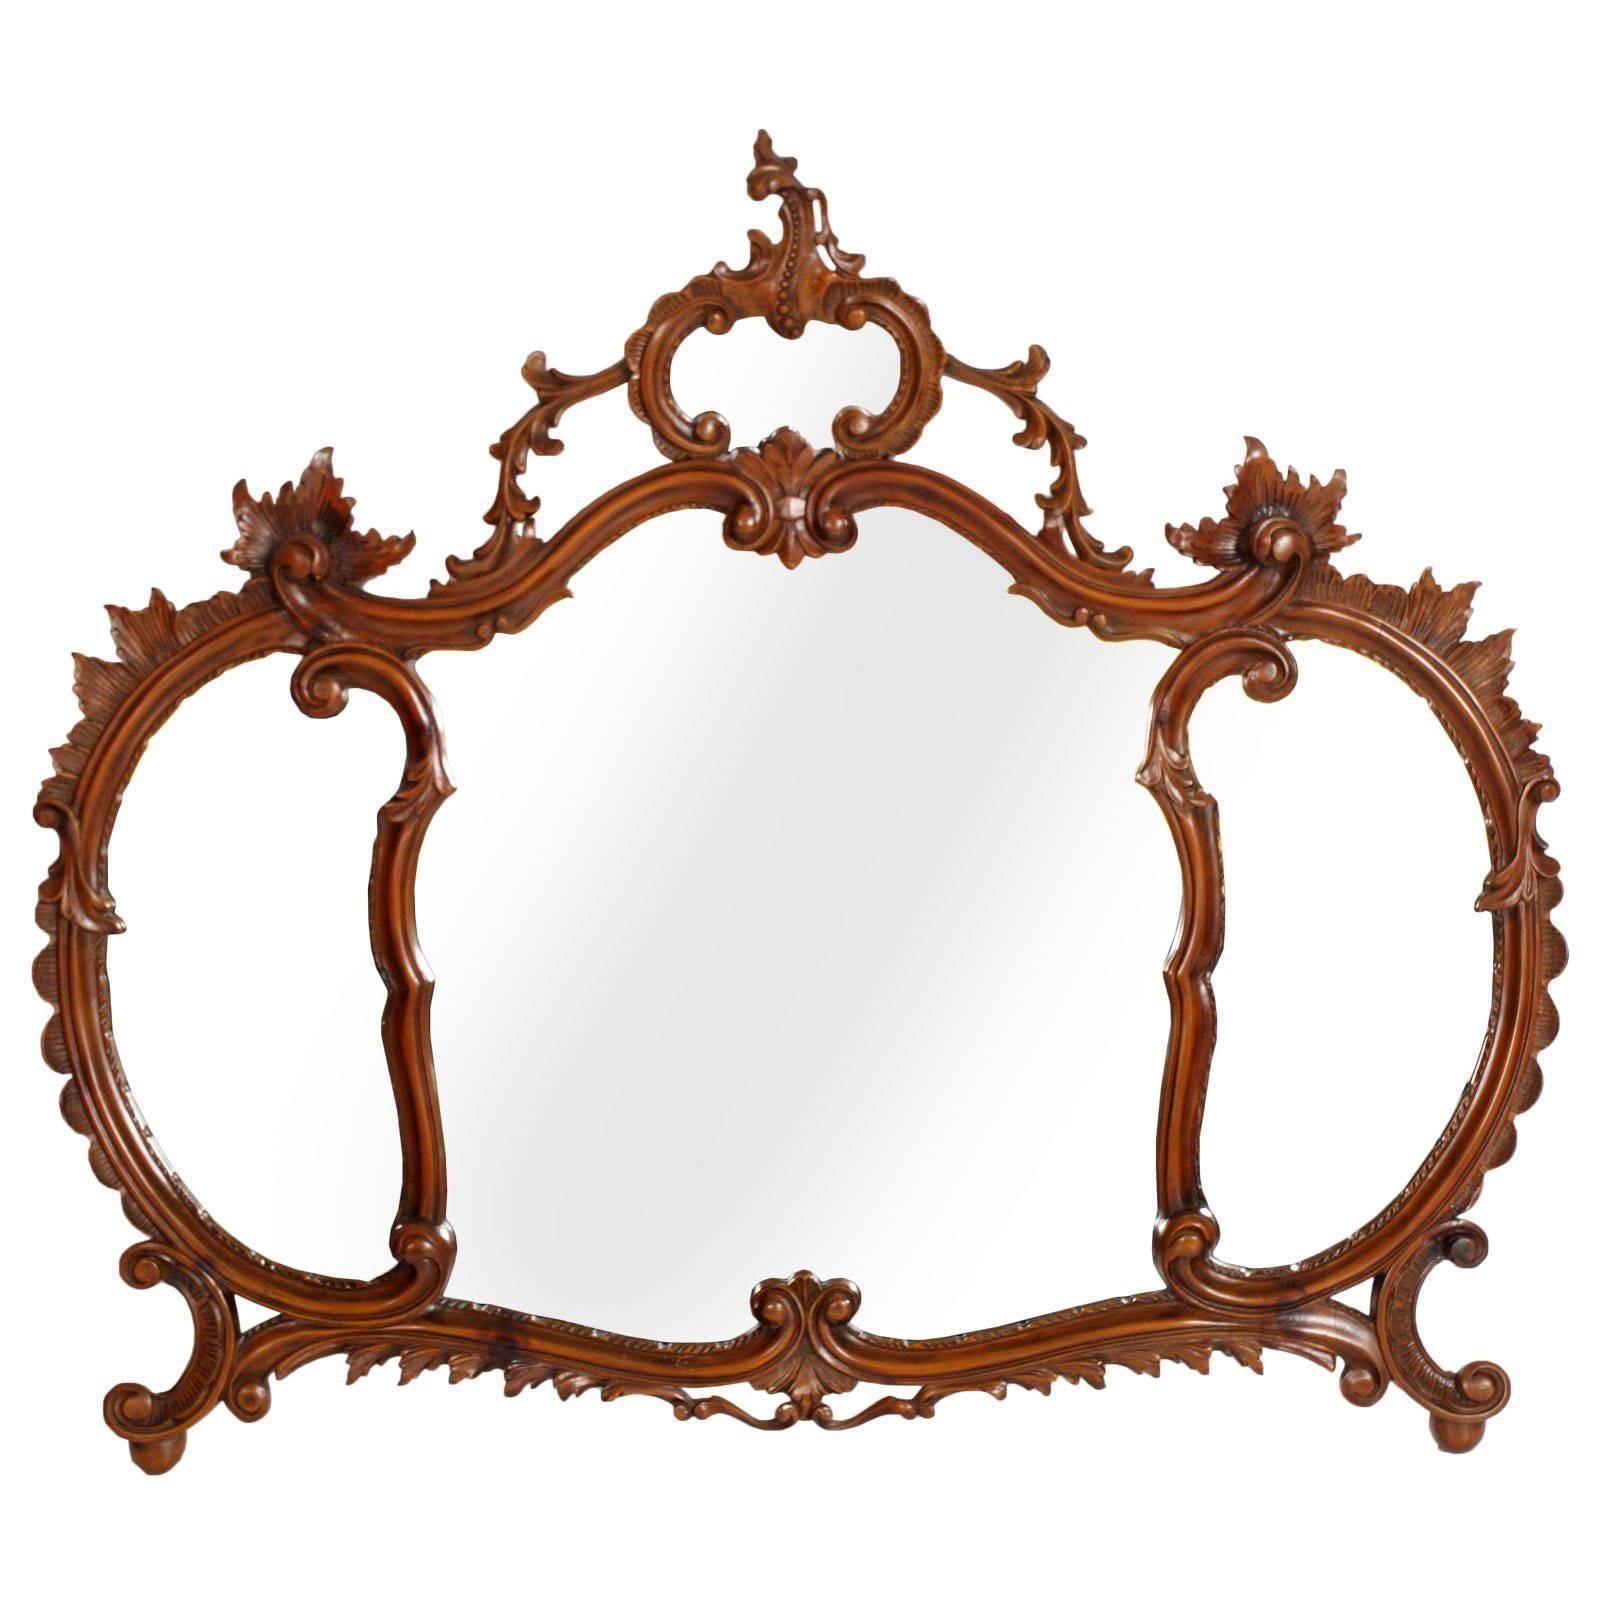 Early 20th Century Venetian Wall Mirror, Carved Walnut, Testolini Attributable